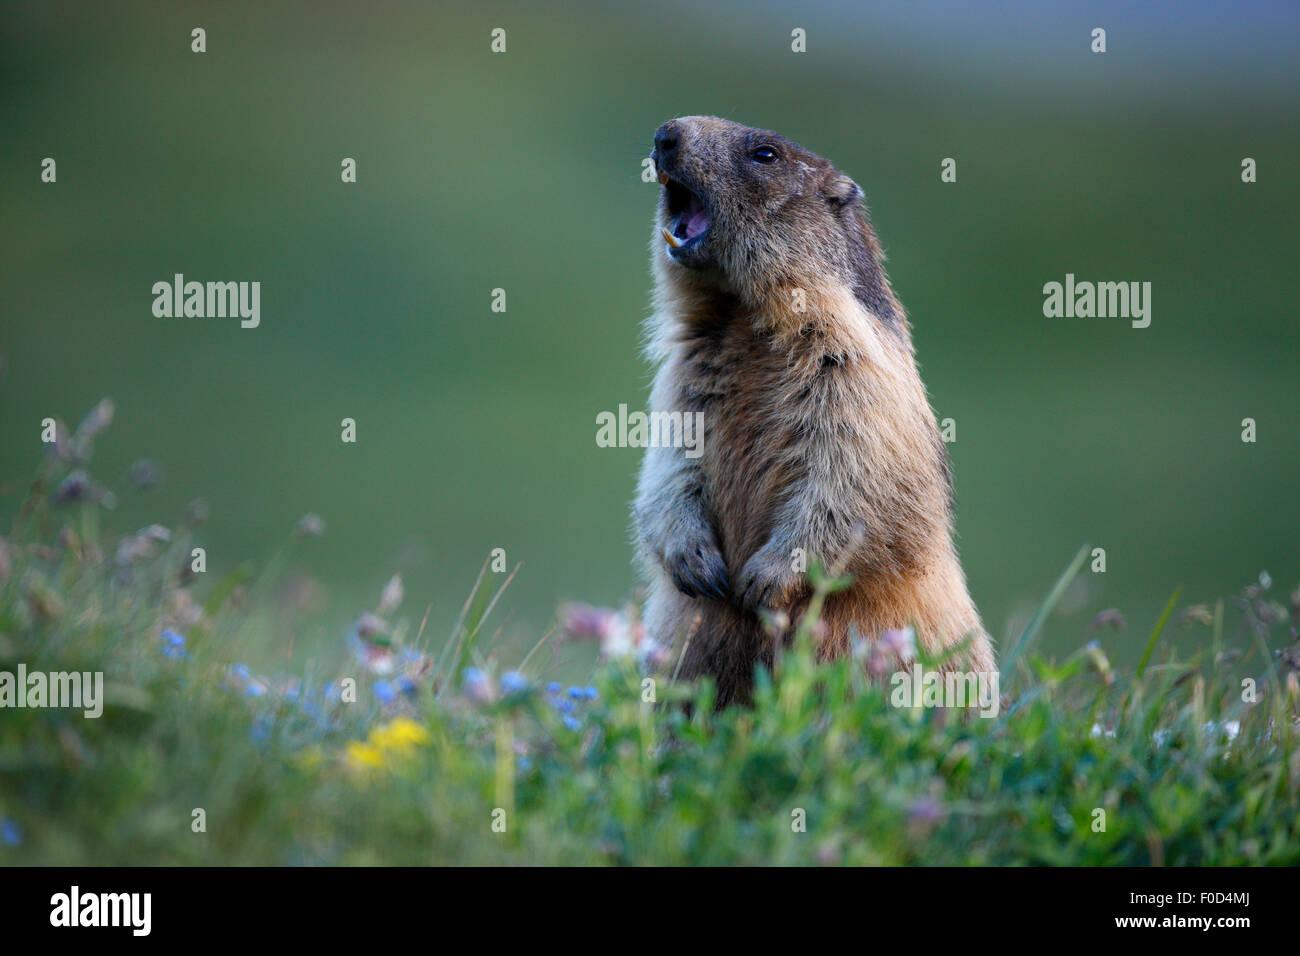 Alpine marmot (Marmota marmota) alert, Hohe Tauern National Park, Austria, July 2008 - Stock Image